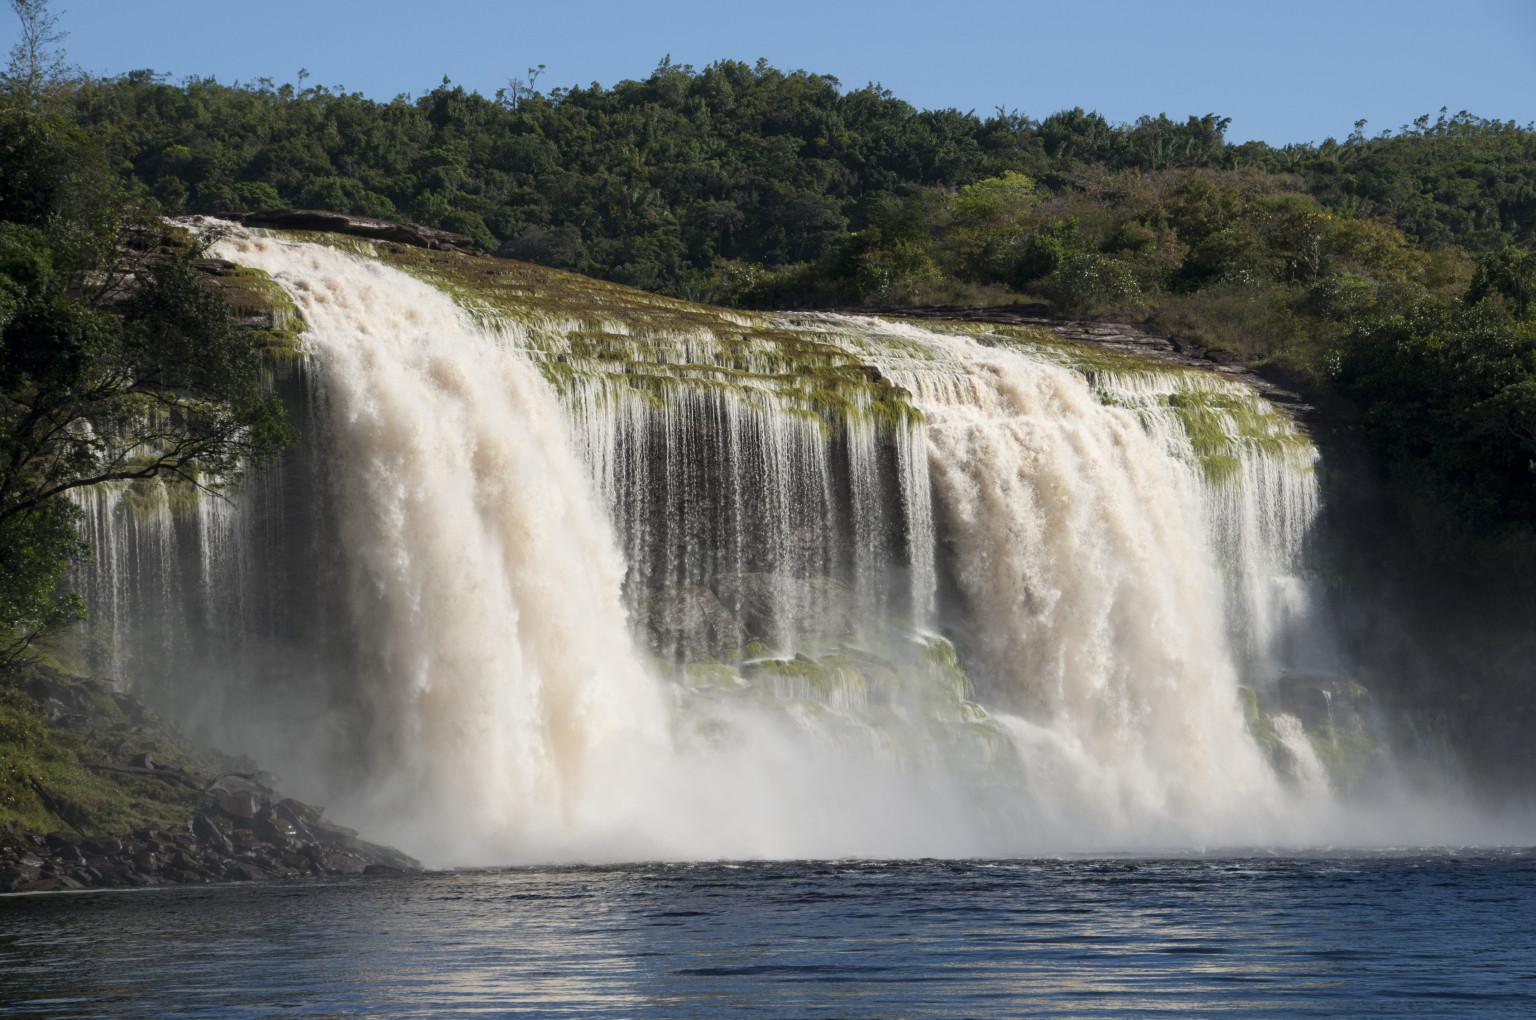 Niagara Falls Hd Wallpaper For Desktop Venezuela Wallpapers High Quality Download Free